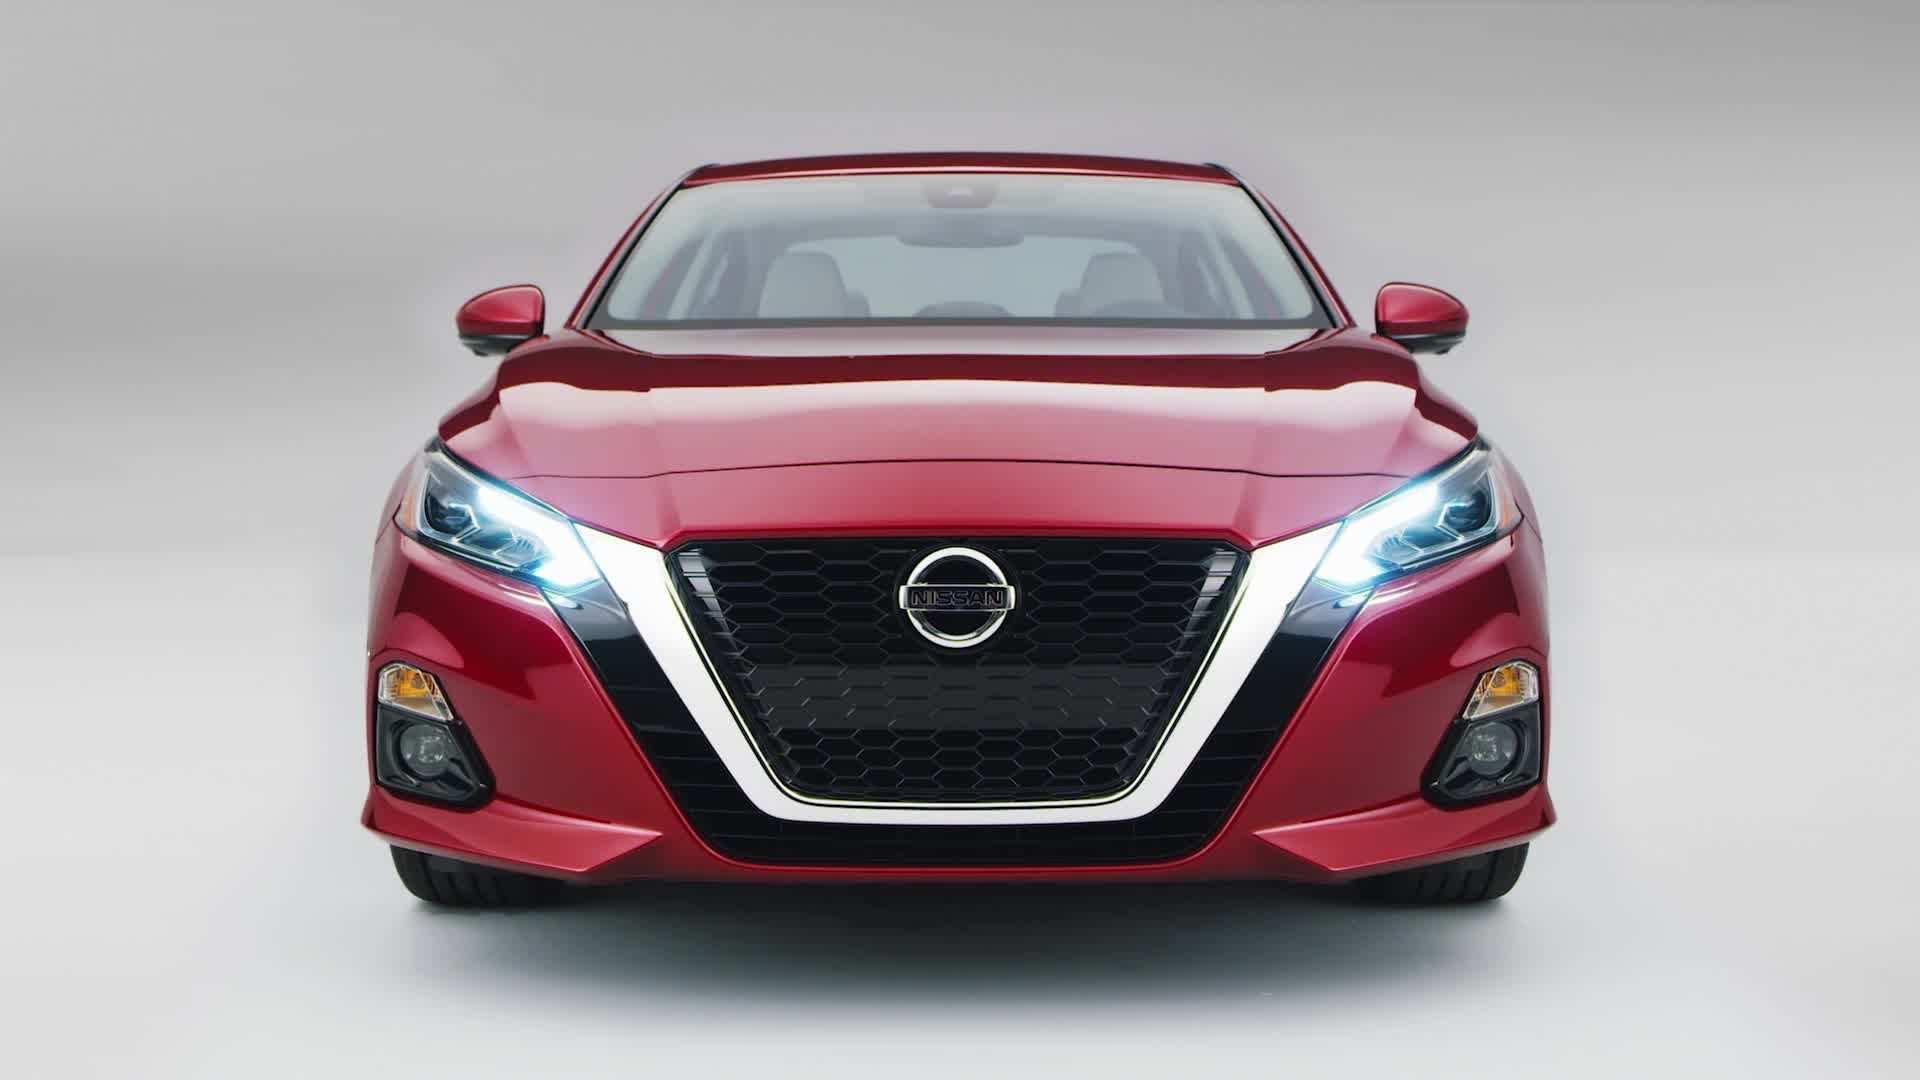 83 All New Best Nissan Elgrand 2019 Concept Exterior for Best Nissan Elgrand 2019 Concept